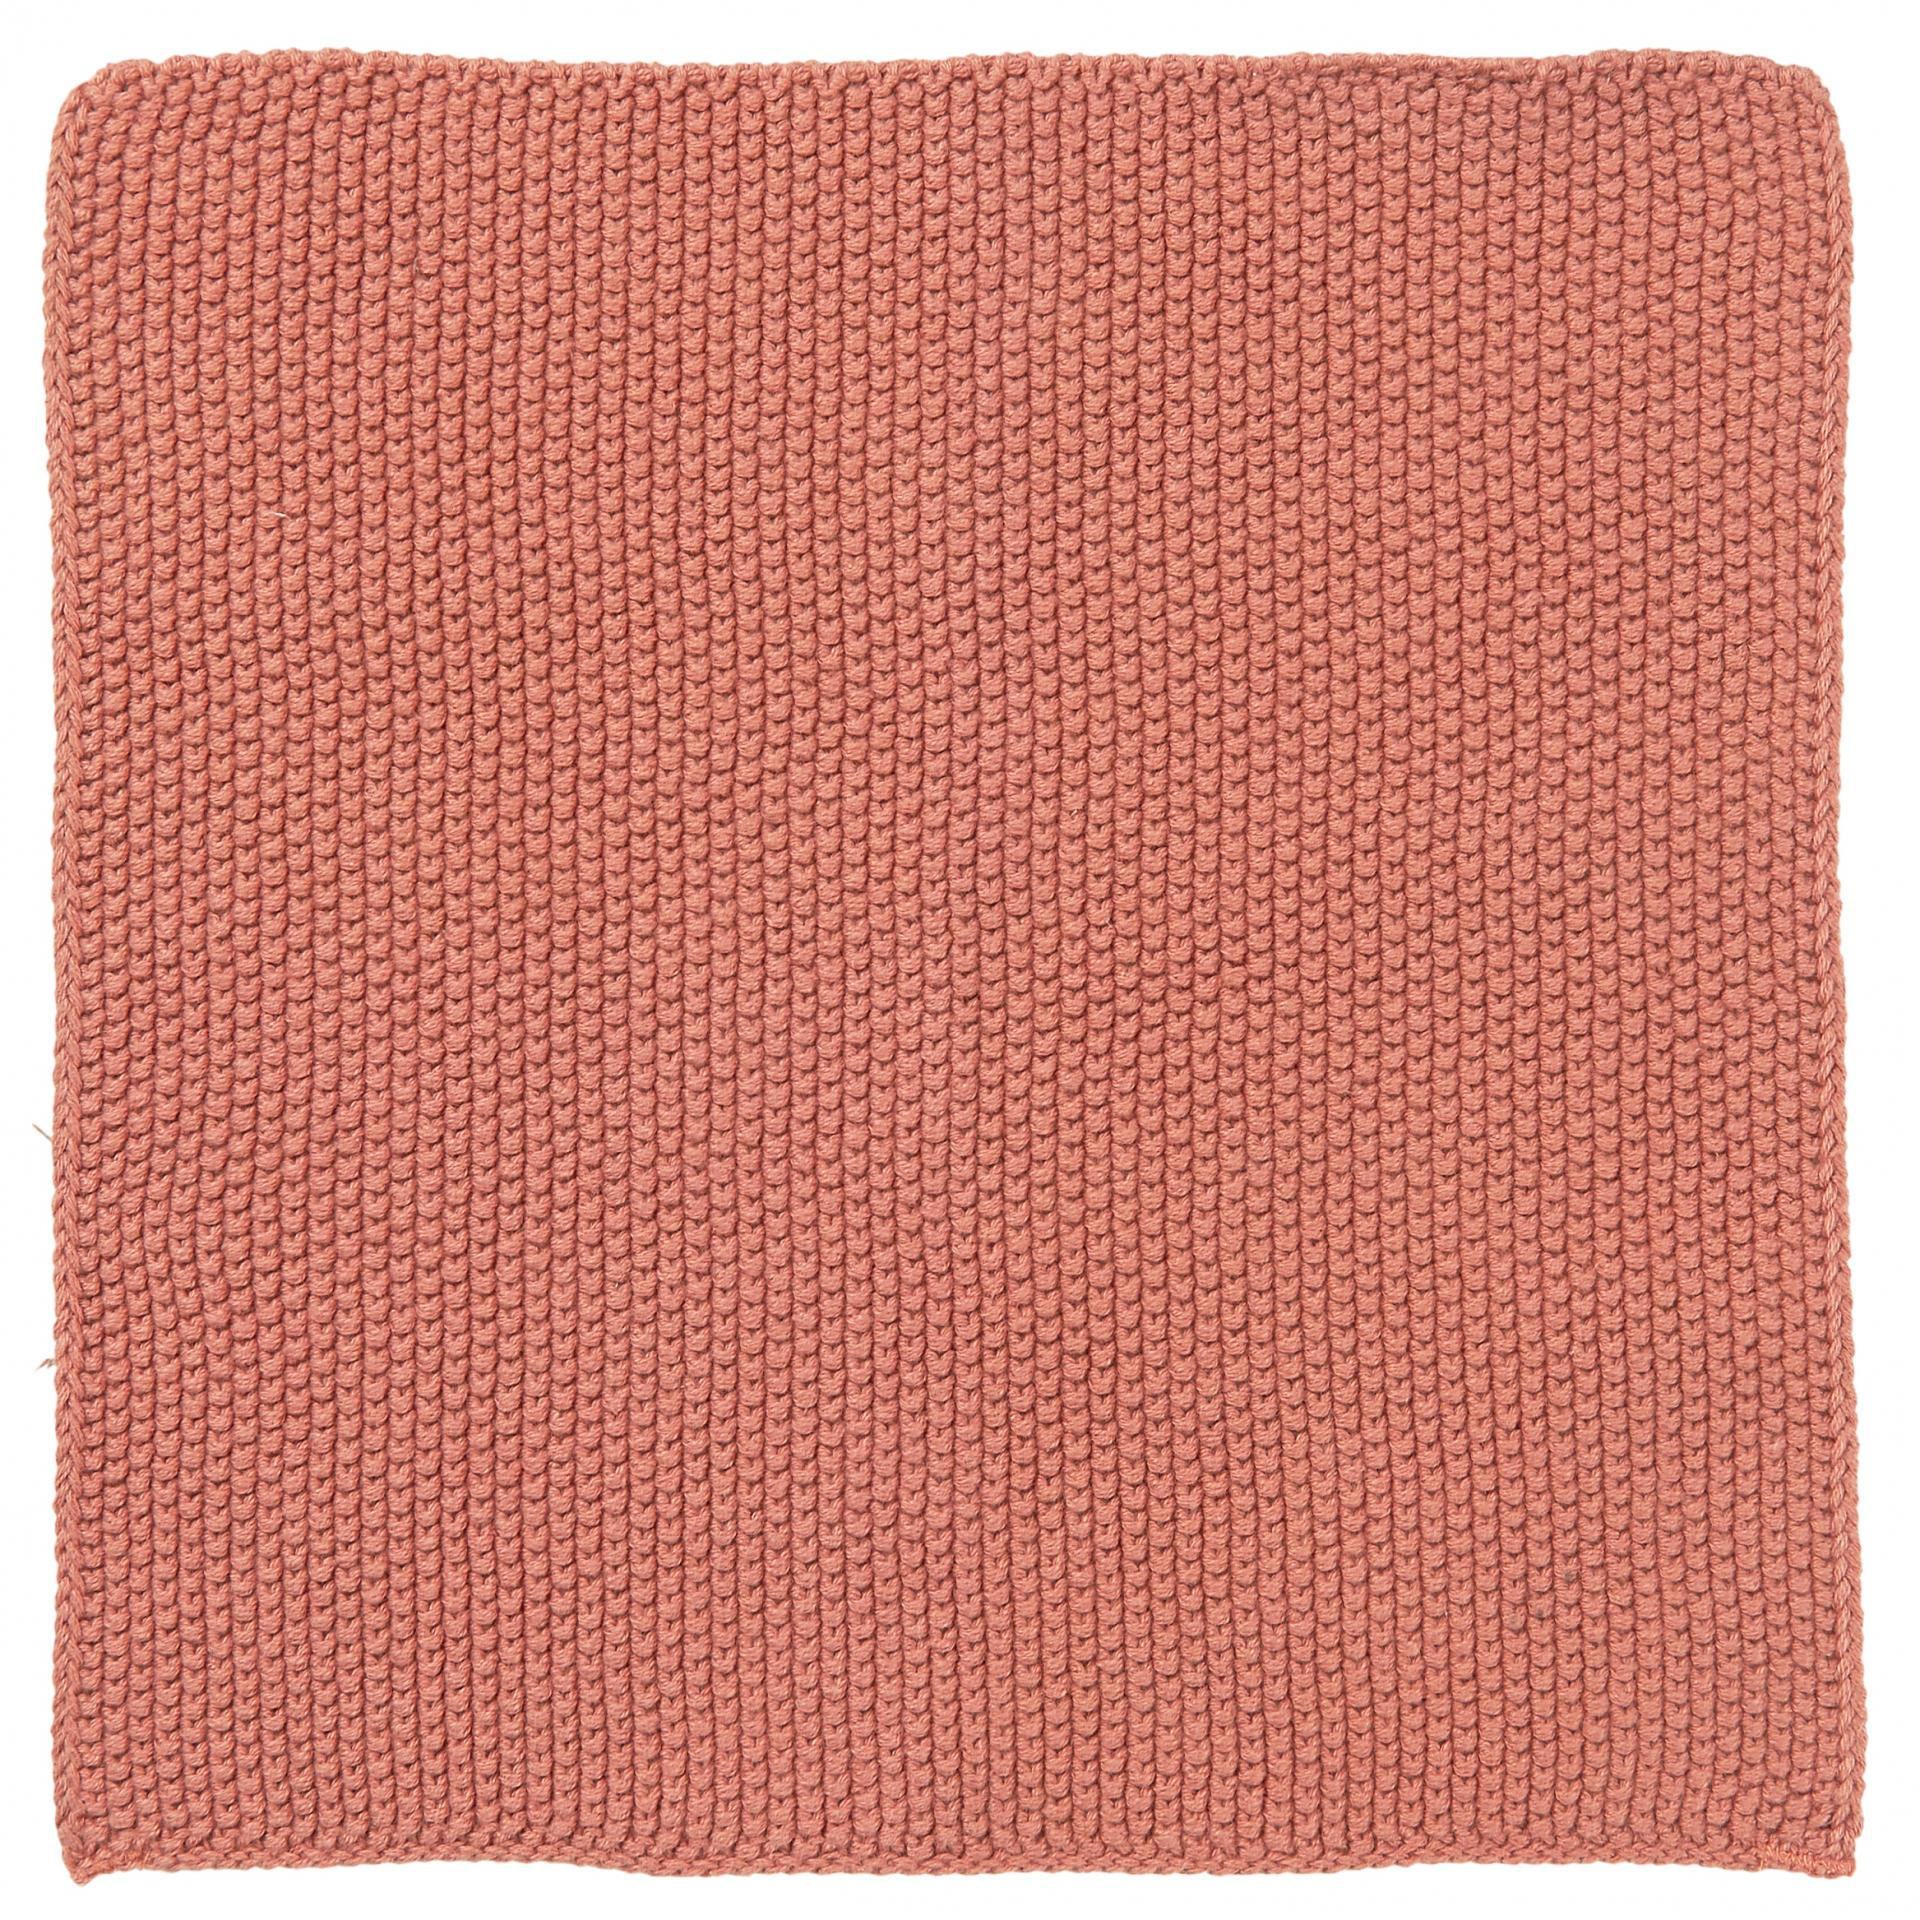 IB LAURSEN Pletený hadřík Mynte Desert Rose, růžová barva, textil